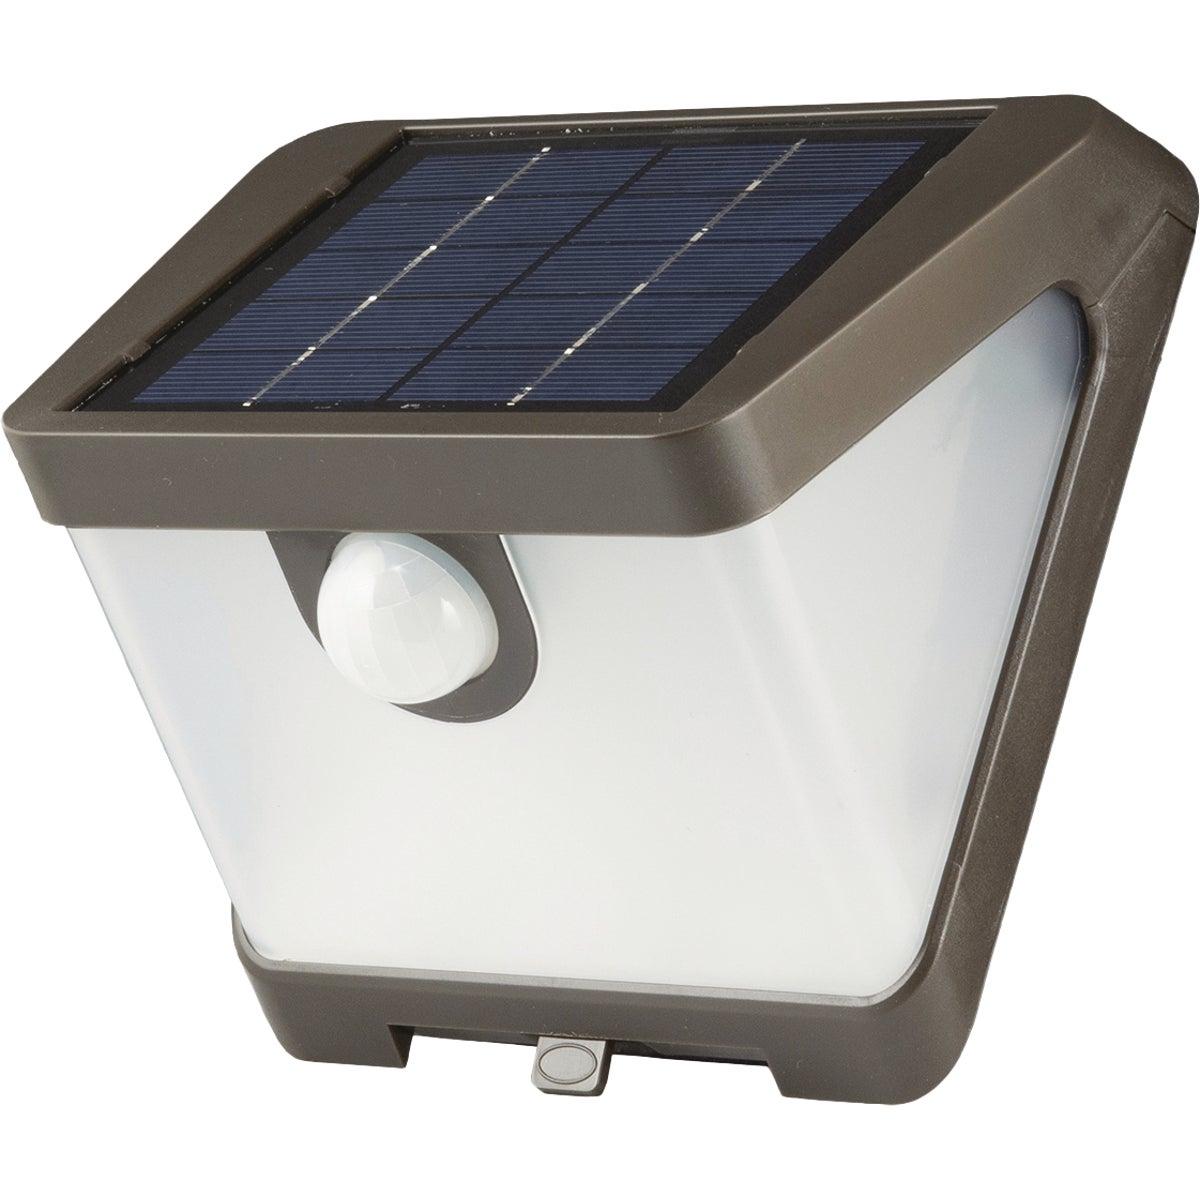 All-Pro Black Motion Sensing Dusk To Dawn LED Floodlight Fixture